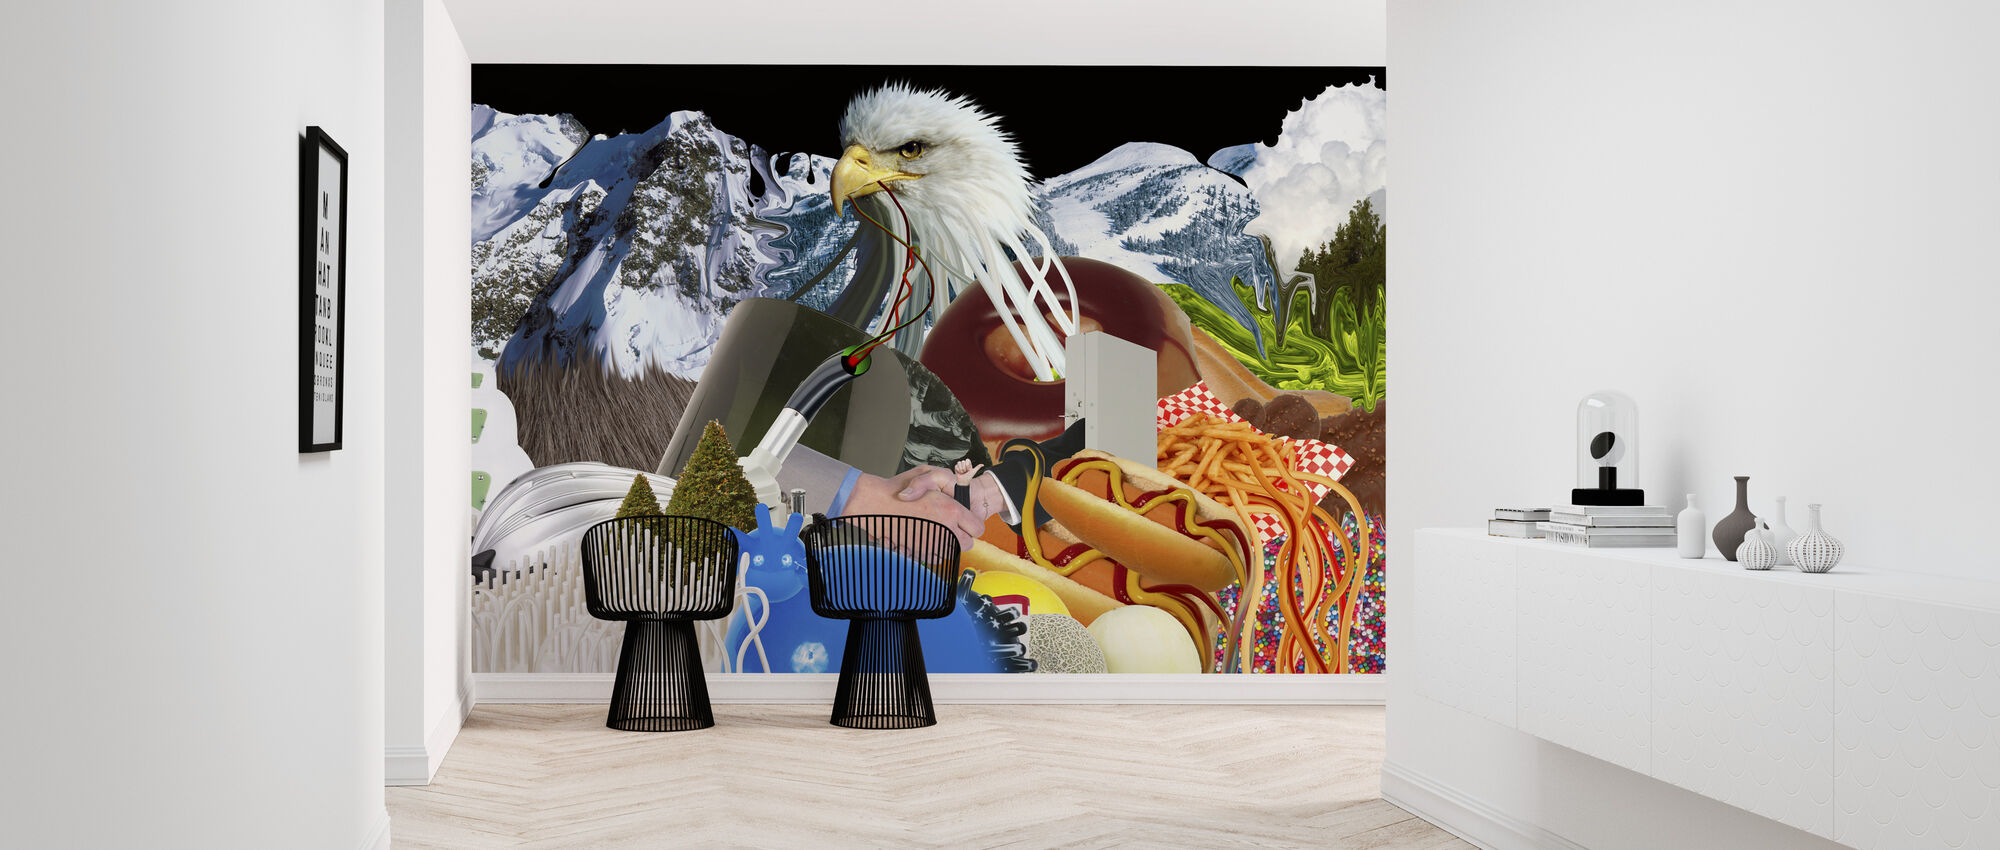 Universal Everything - Eaglemountain - Wallpaper - Hallway